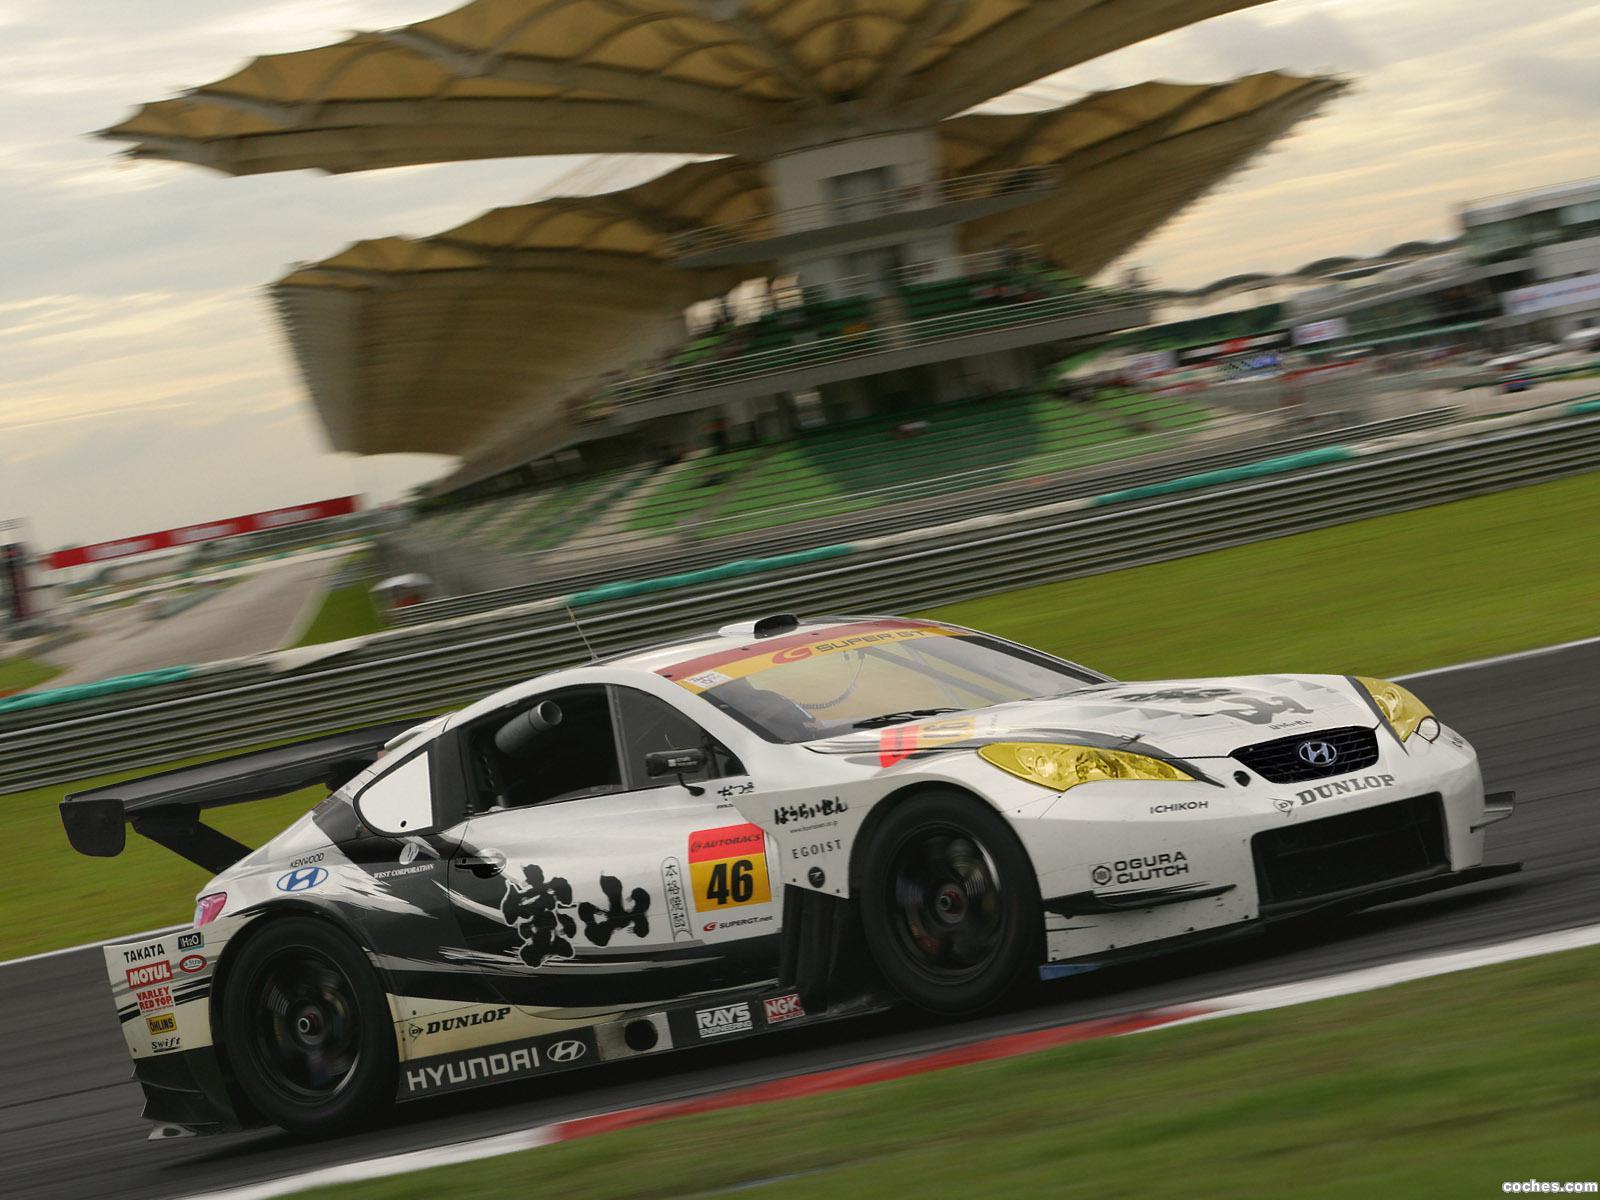 Foto 0 de Hyundai Genesis Coupe Super GT 2009